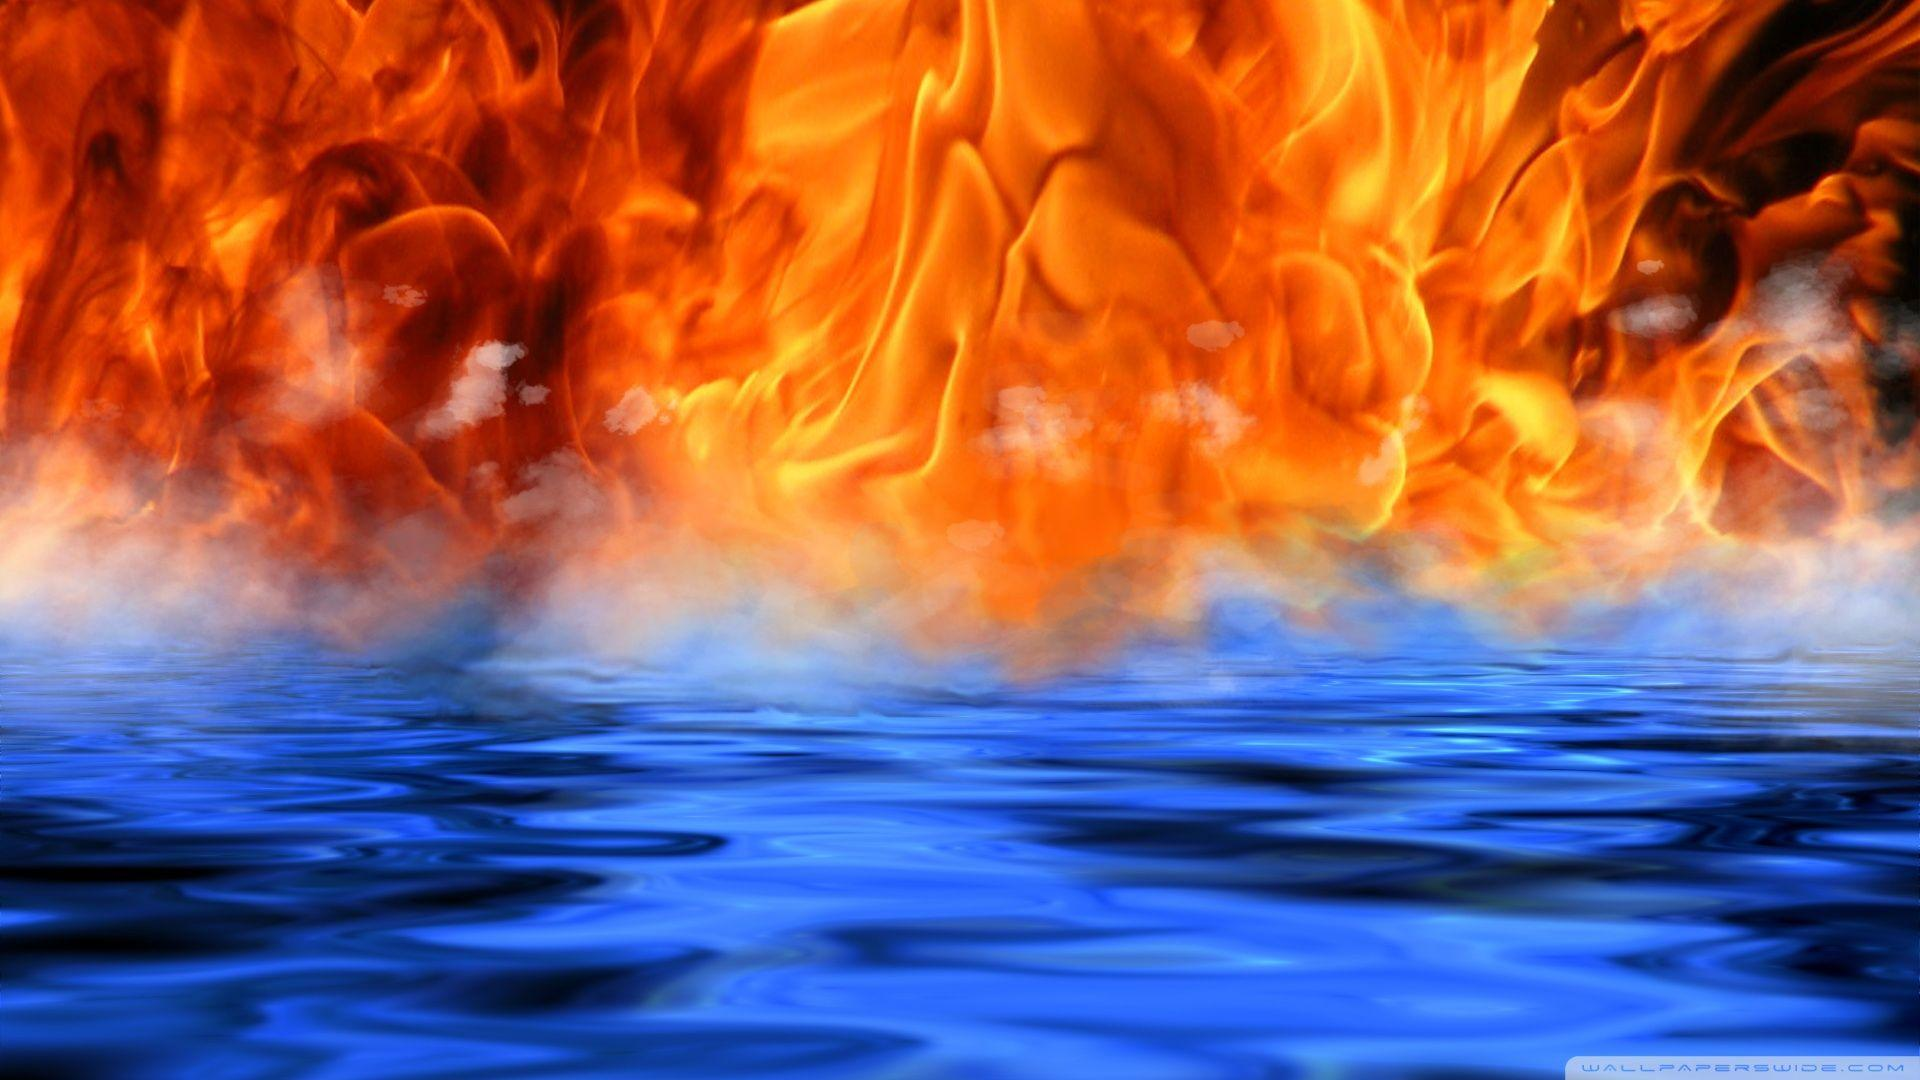 Free Fire Hd Wallpaper 1080p